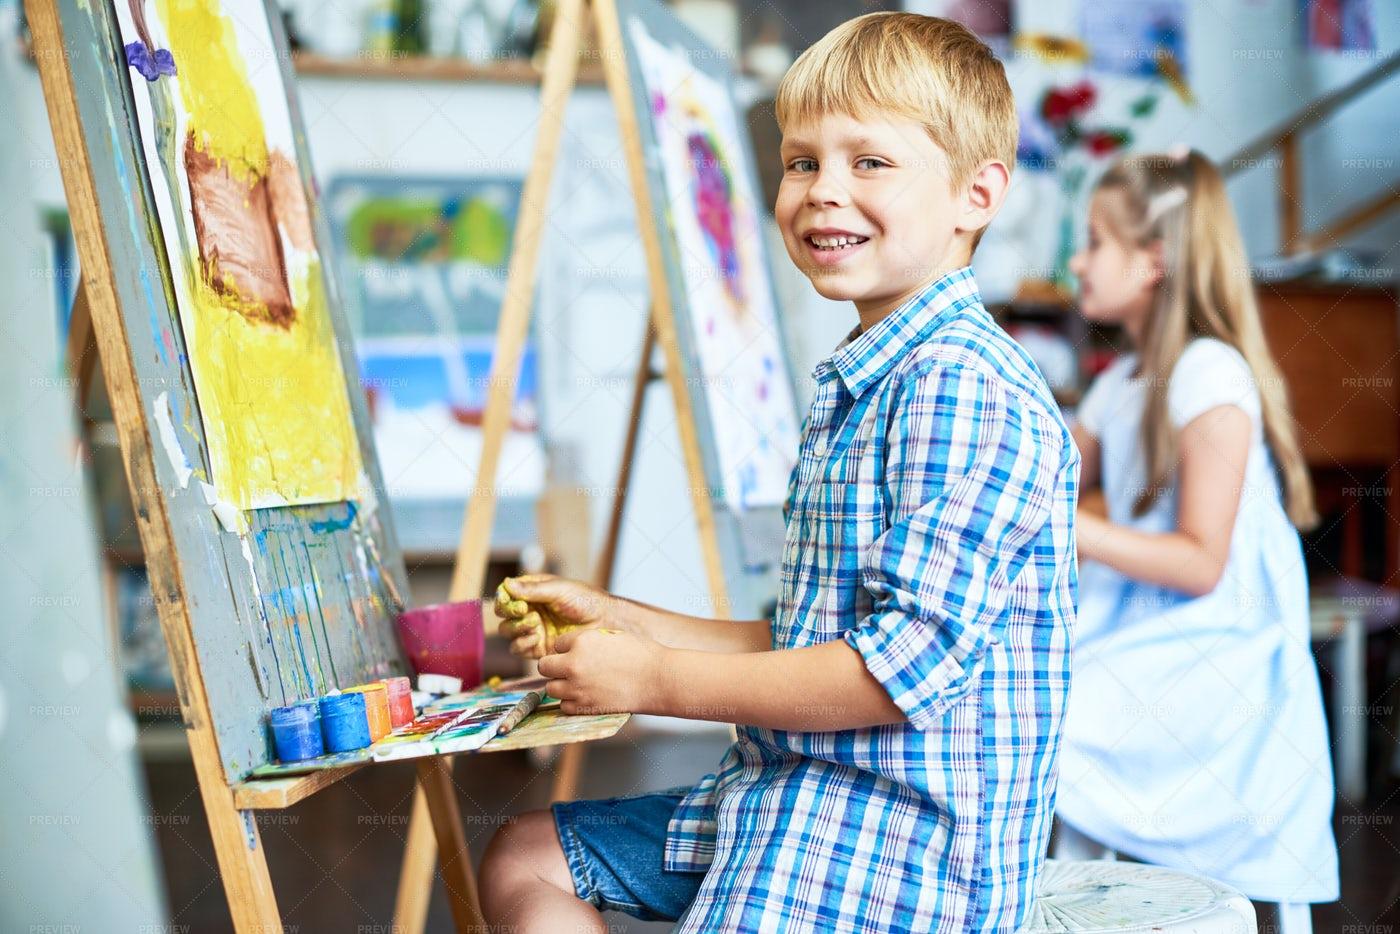 Smiling Little Boy In Art Class: Stock Photos